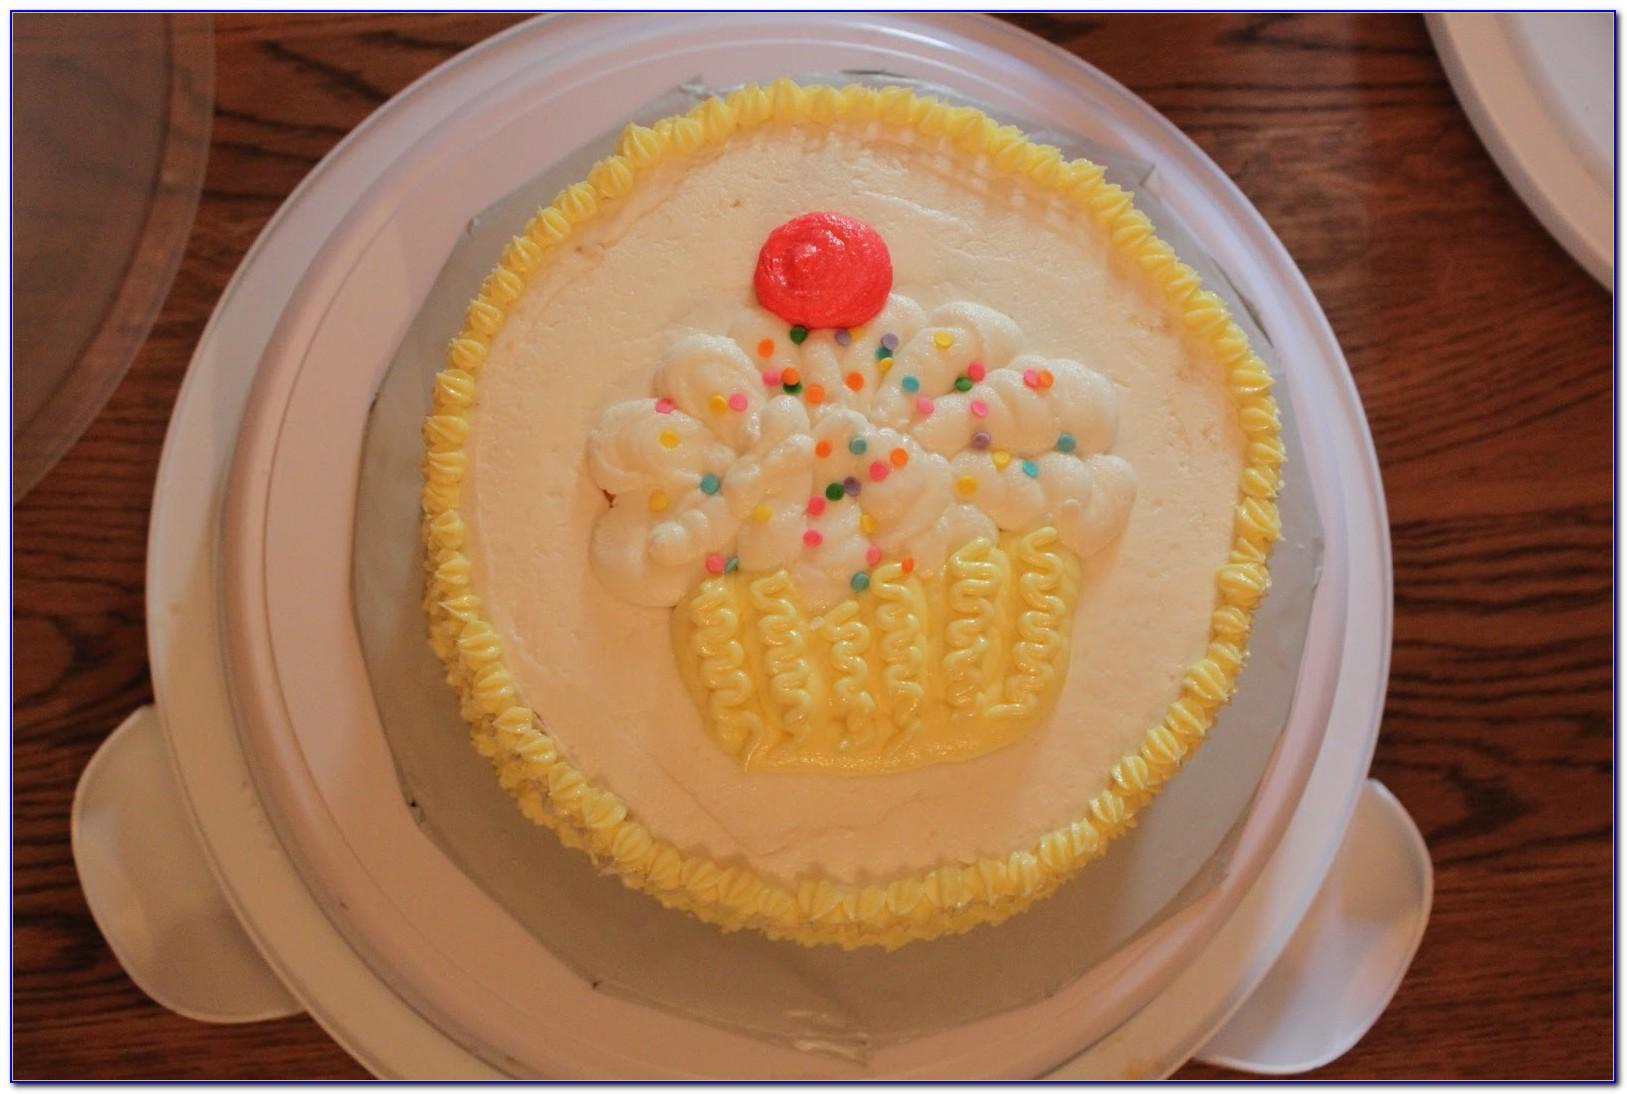 Wilton Cake Decorating Classes Michaels